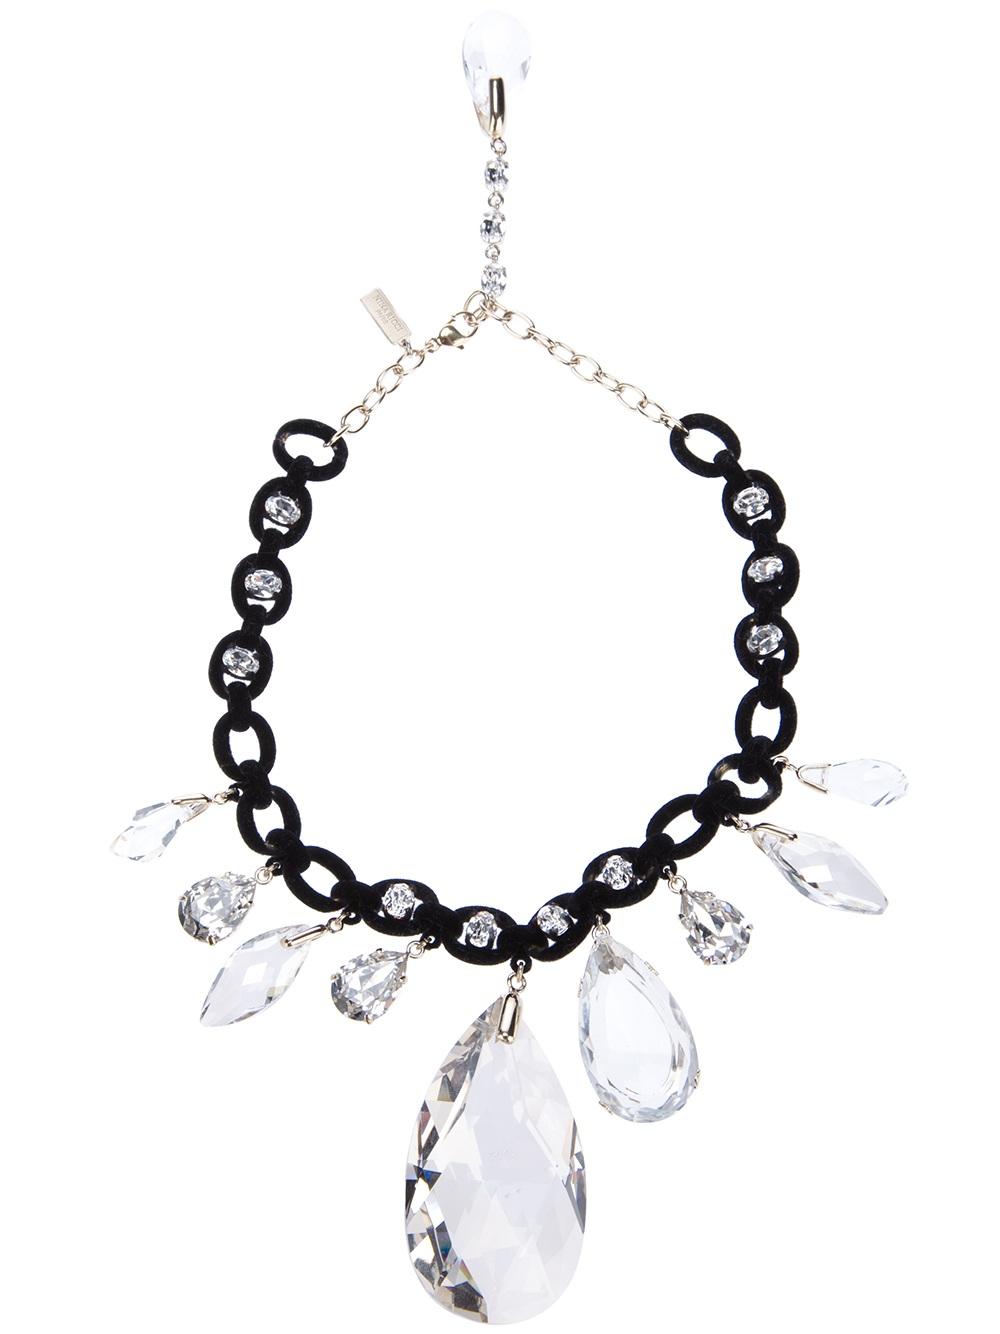 crystal studded choker - White Nina Ricci xcKImFLlhK